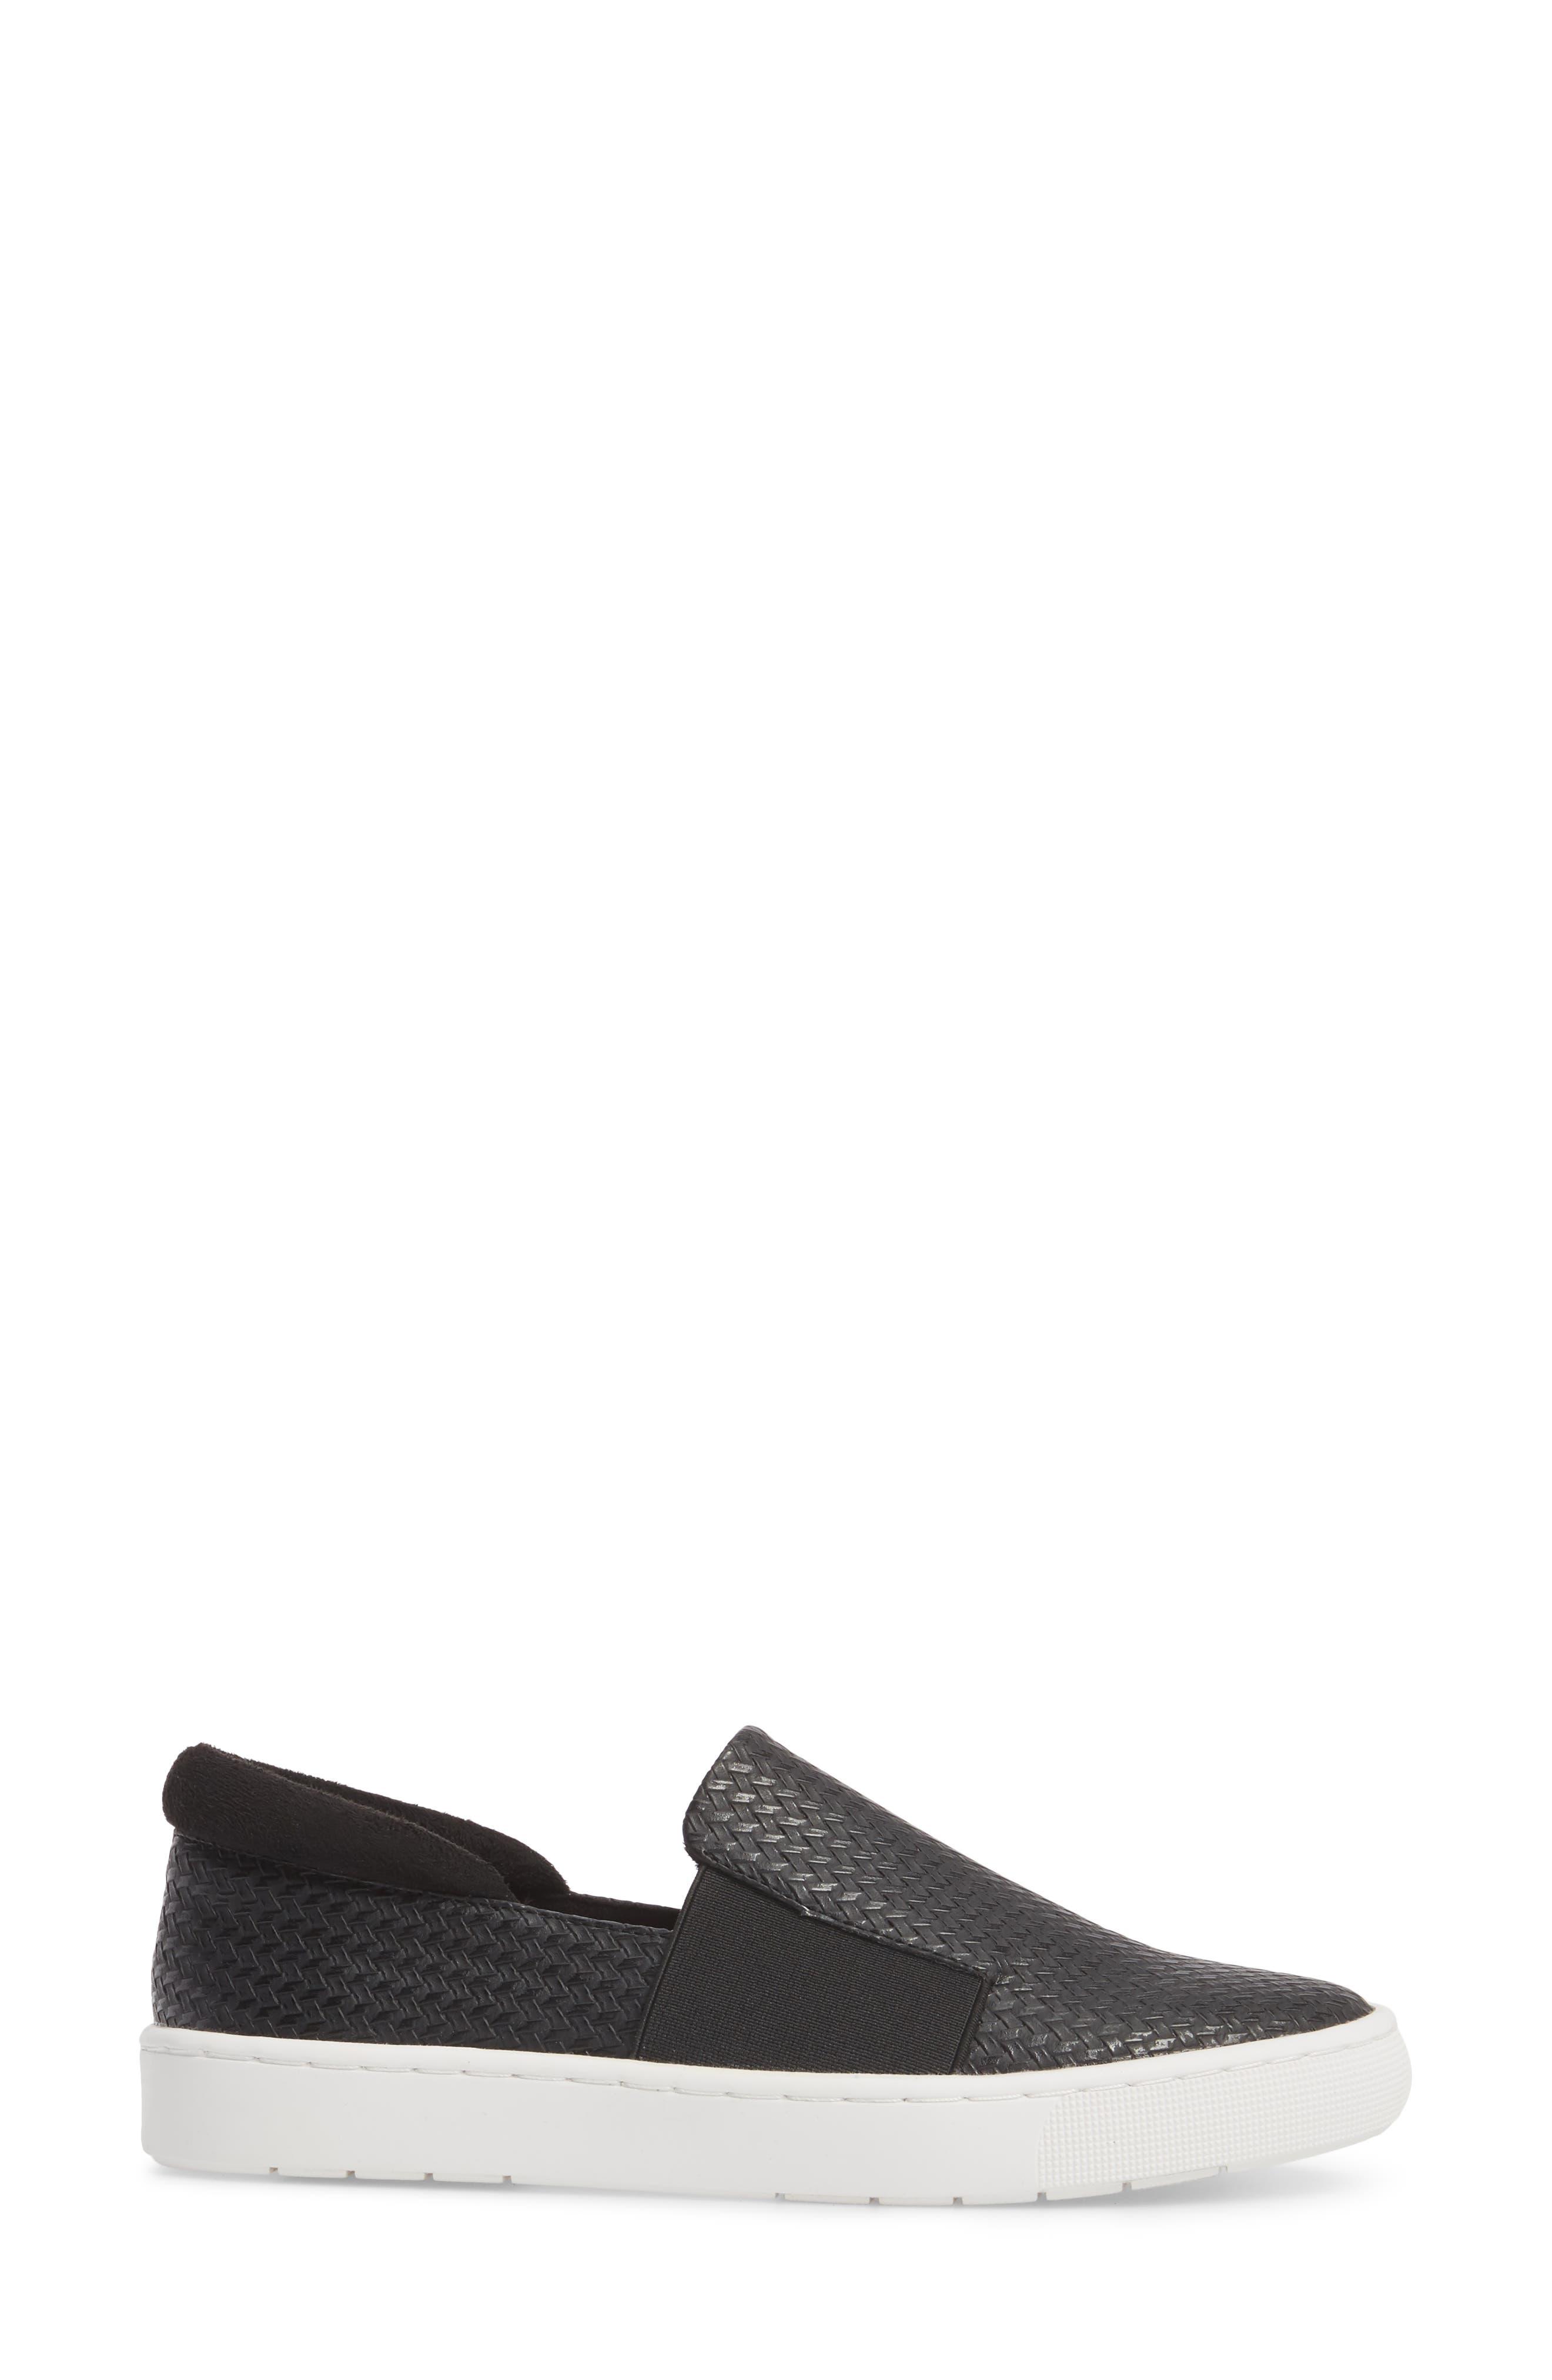 BELLA VITA, Ramp II Slip-On Sneaker, Alternate thumbnail 3, color, BLACK FABRIC